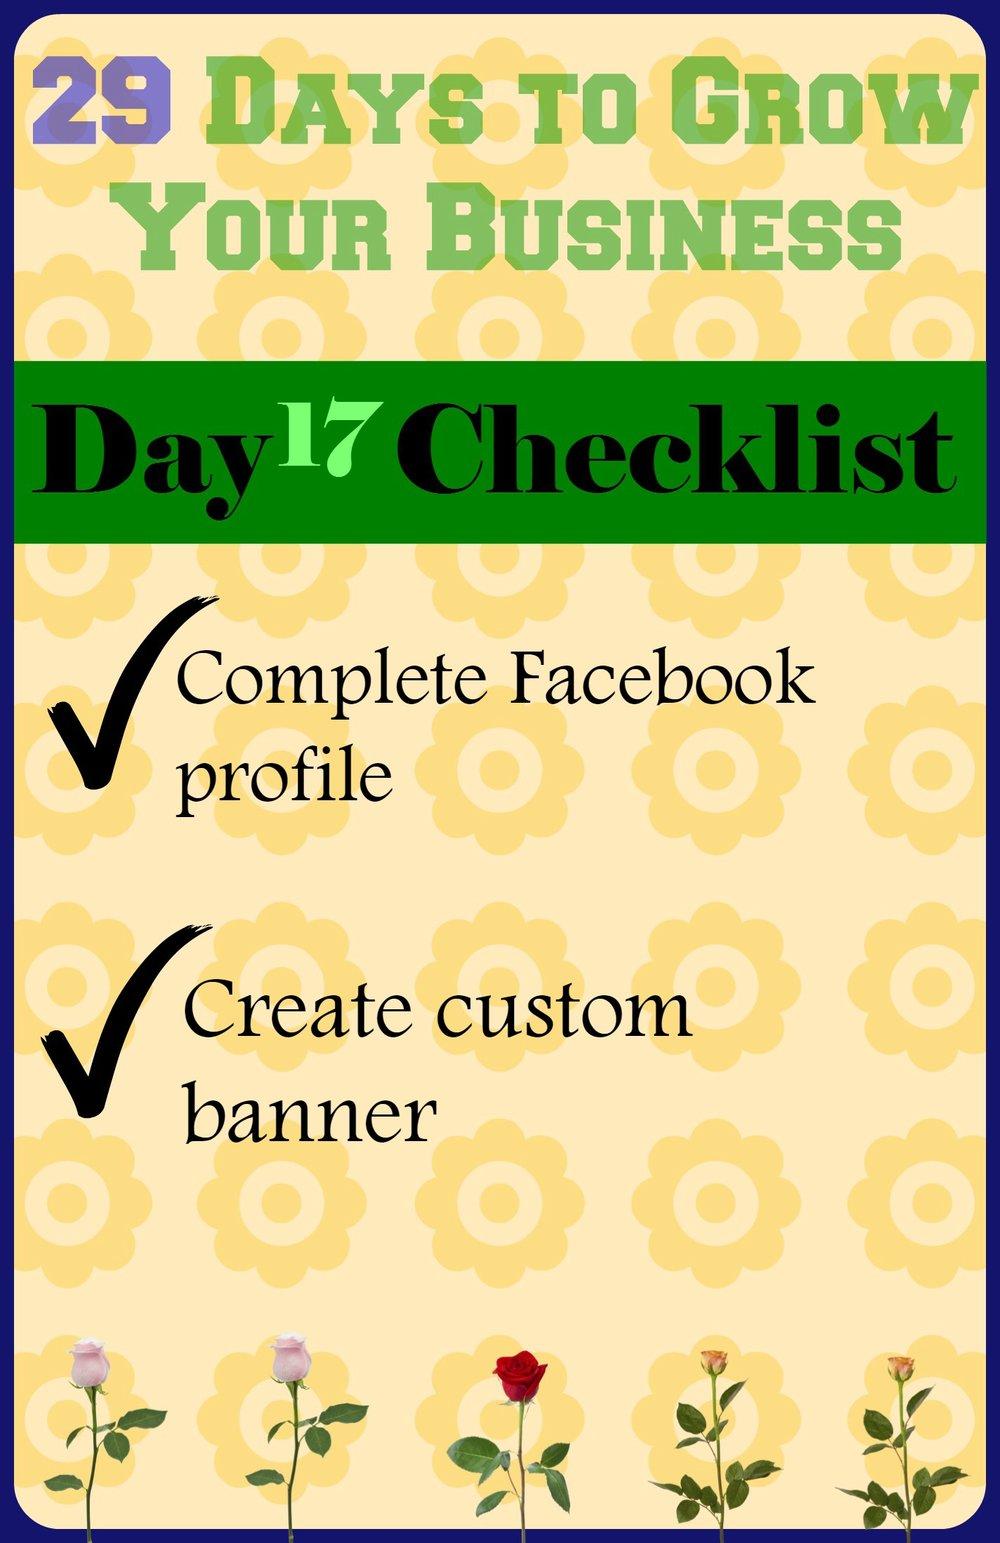 day 17 pinterest challenge.jpg